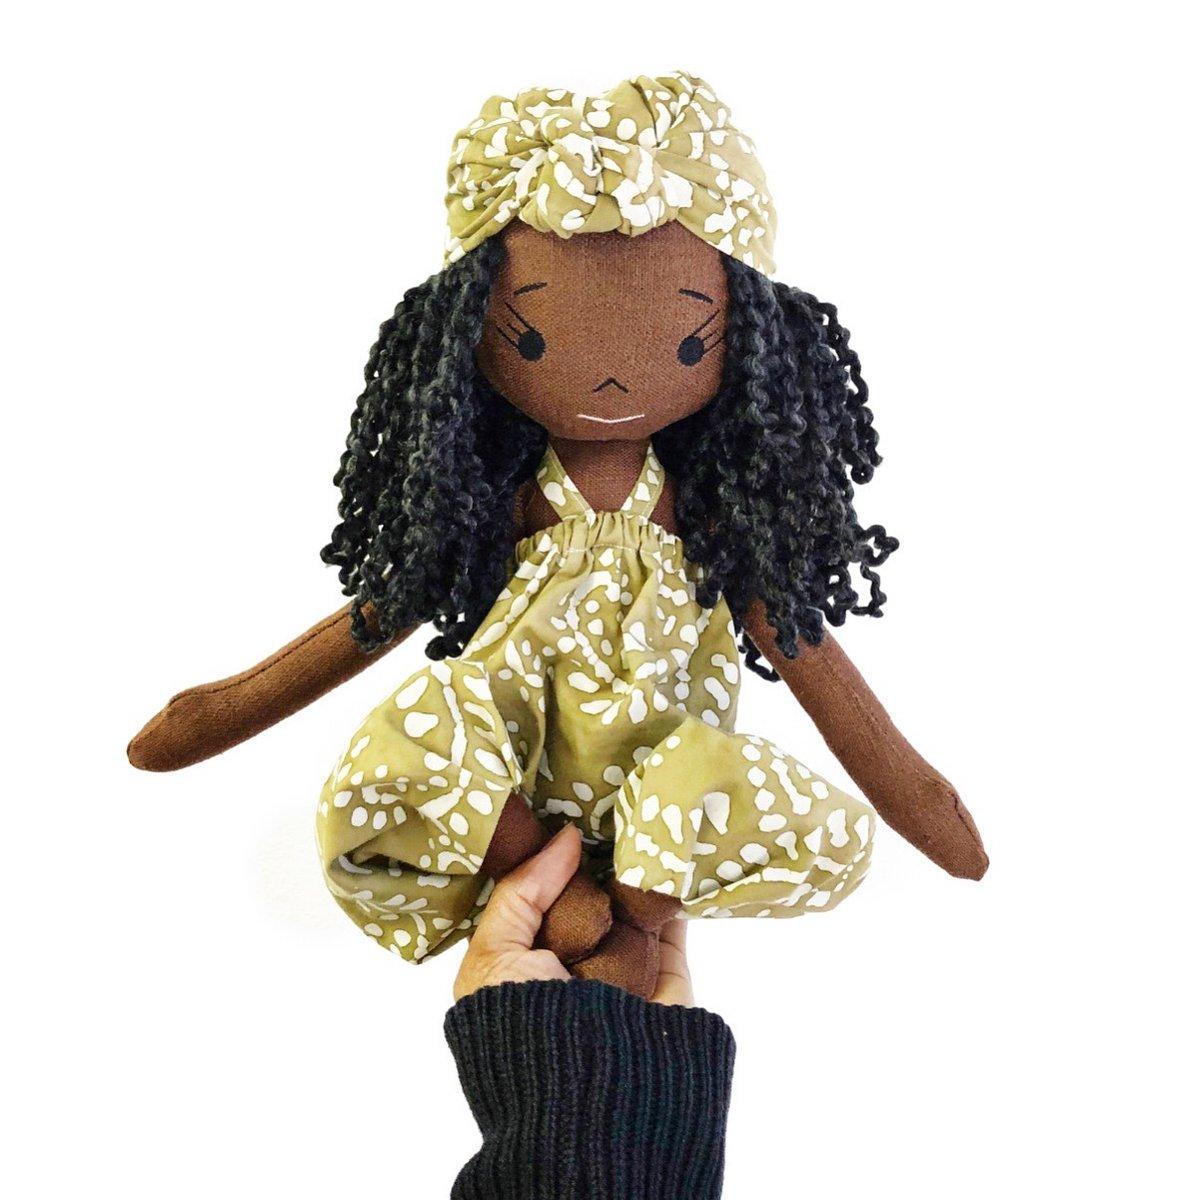 Nia Handmade Linen Doll (Waitlist Preorder Item - ship date Oct 1-Mar 30,2022)